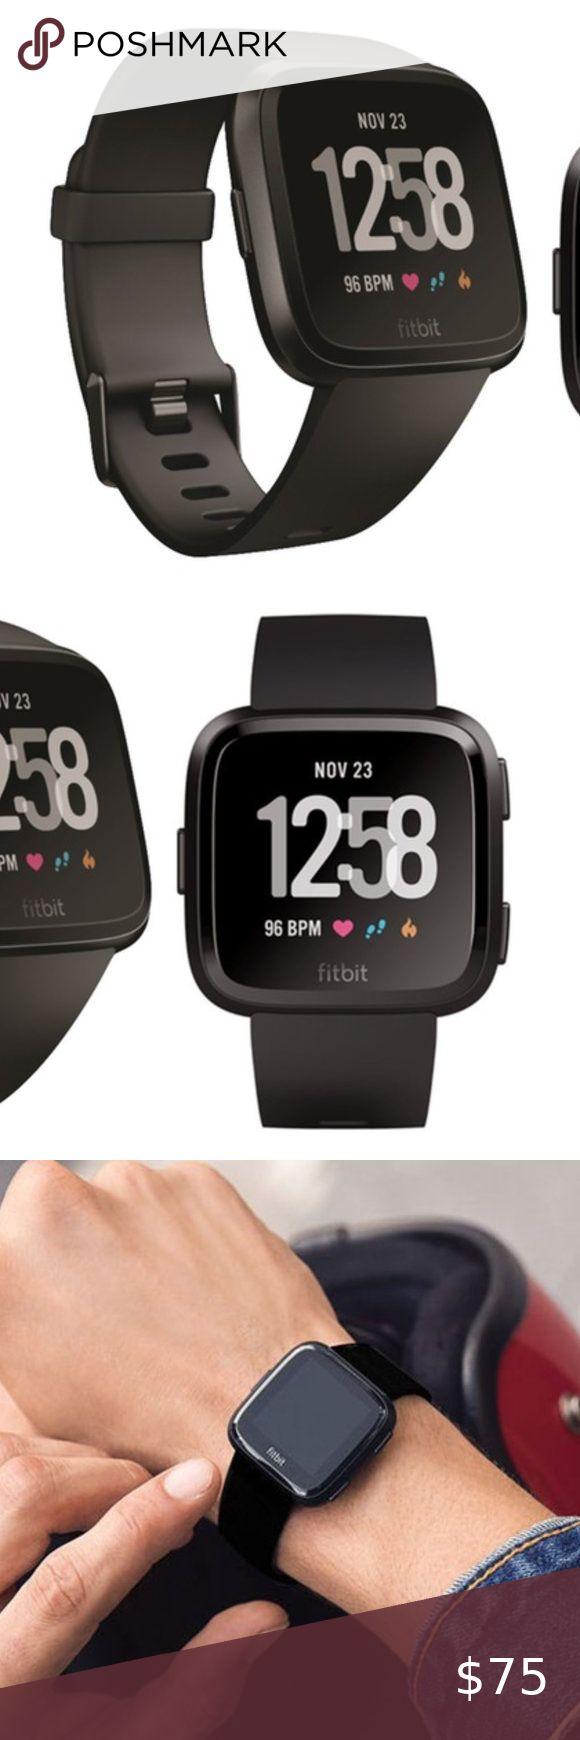 Fitbit Versa Activity Fitness Tracker (New) •Lightweight